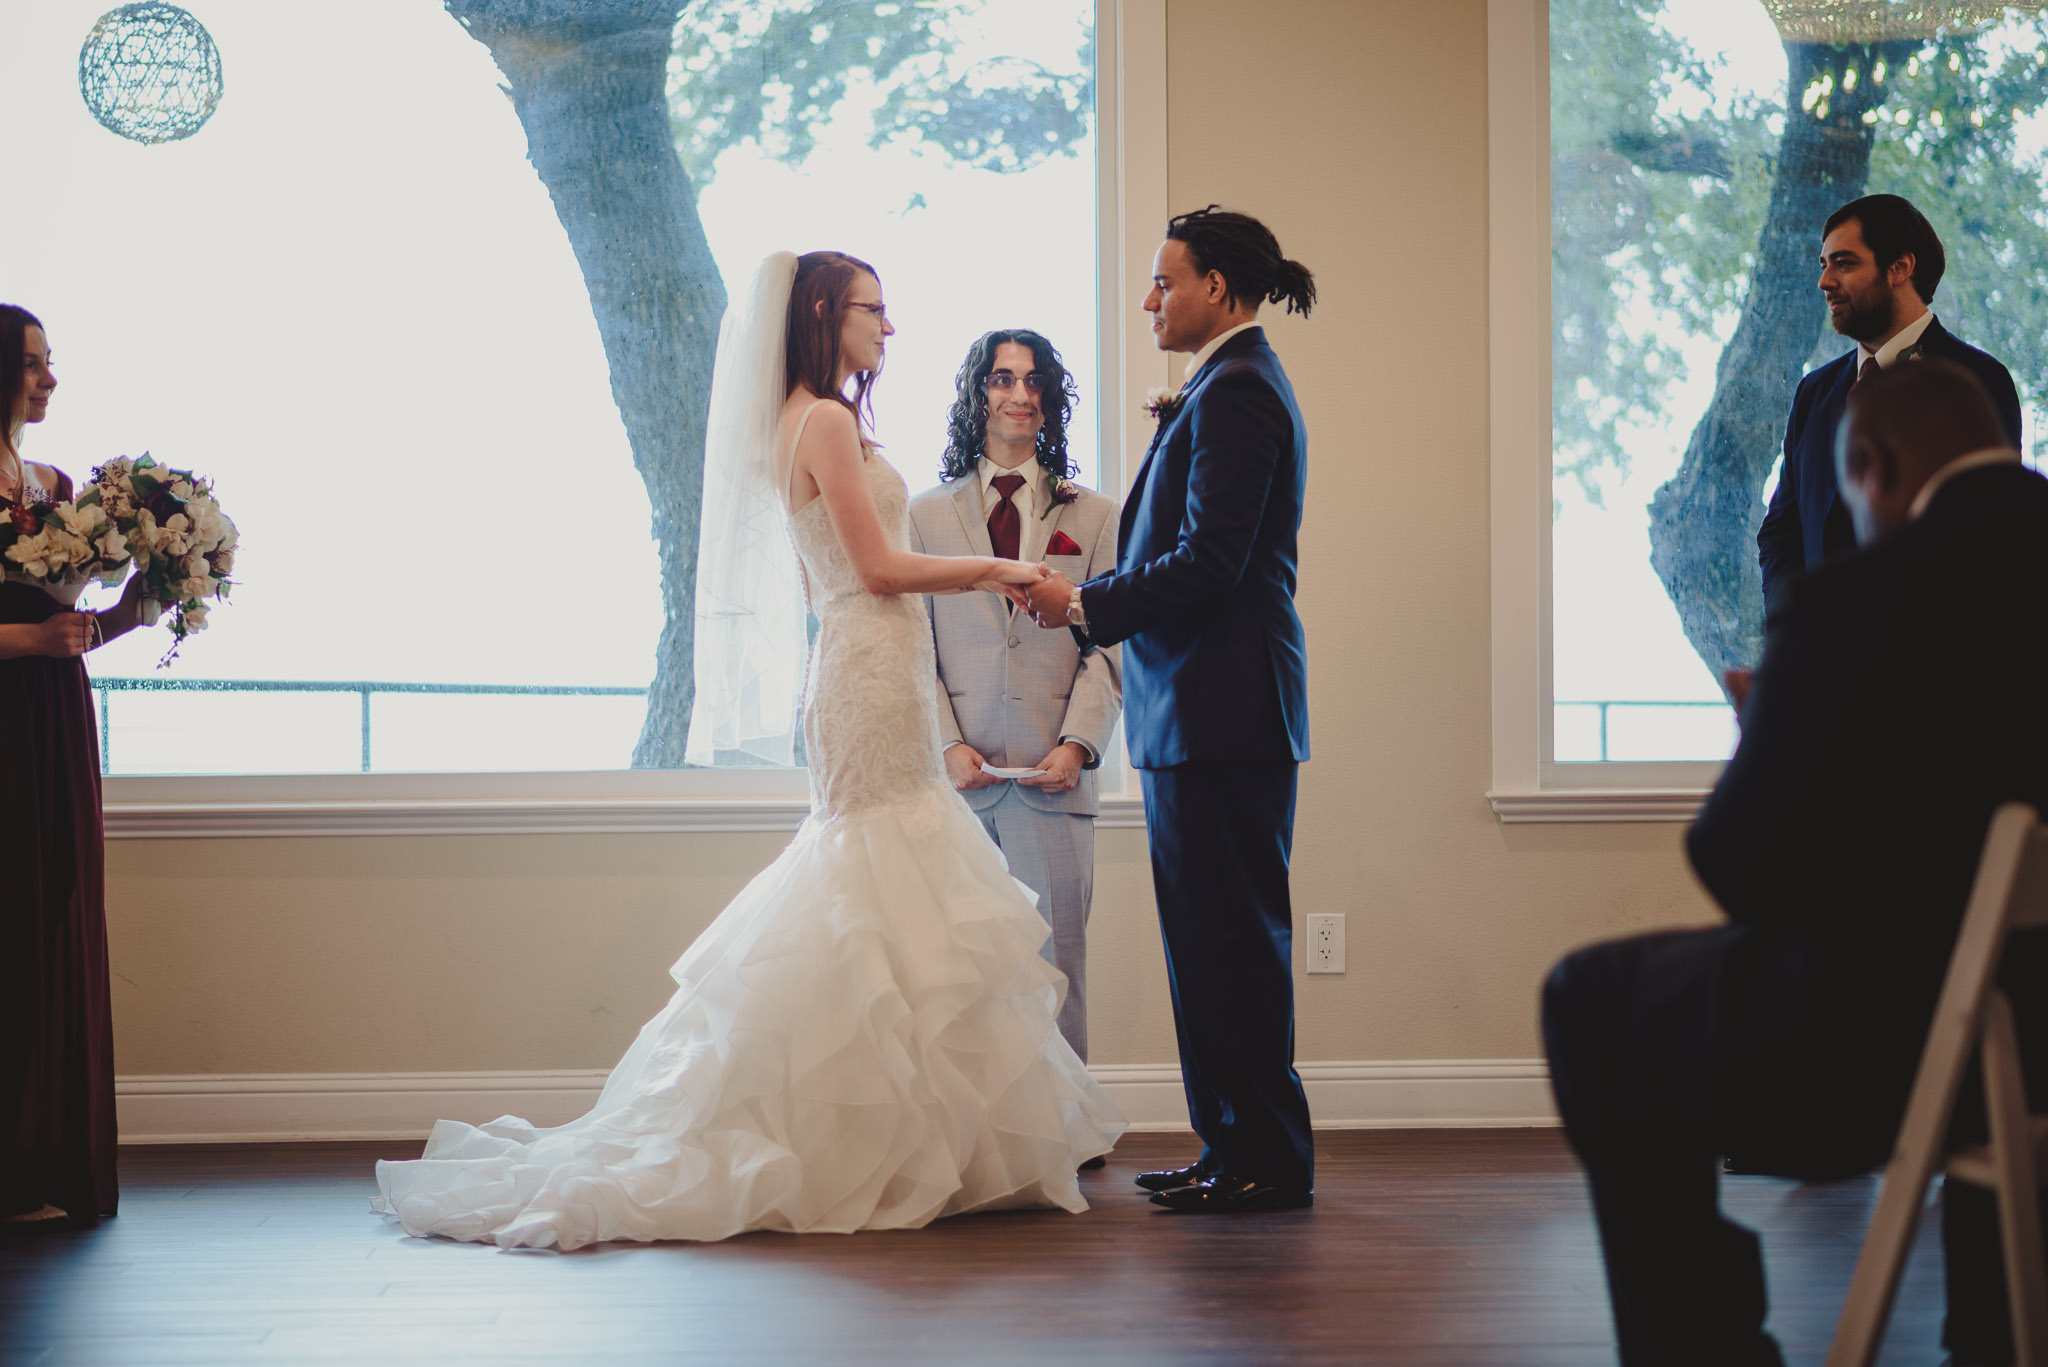 Austin-Texas-Wedding-Vintage-Villas-0026.jpg